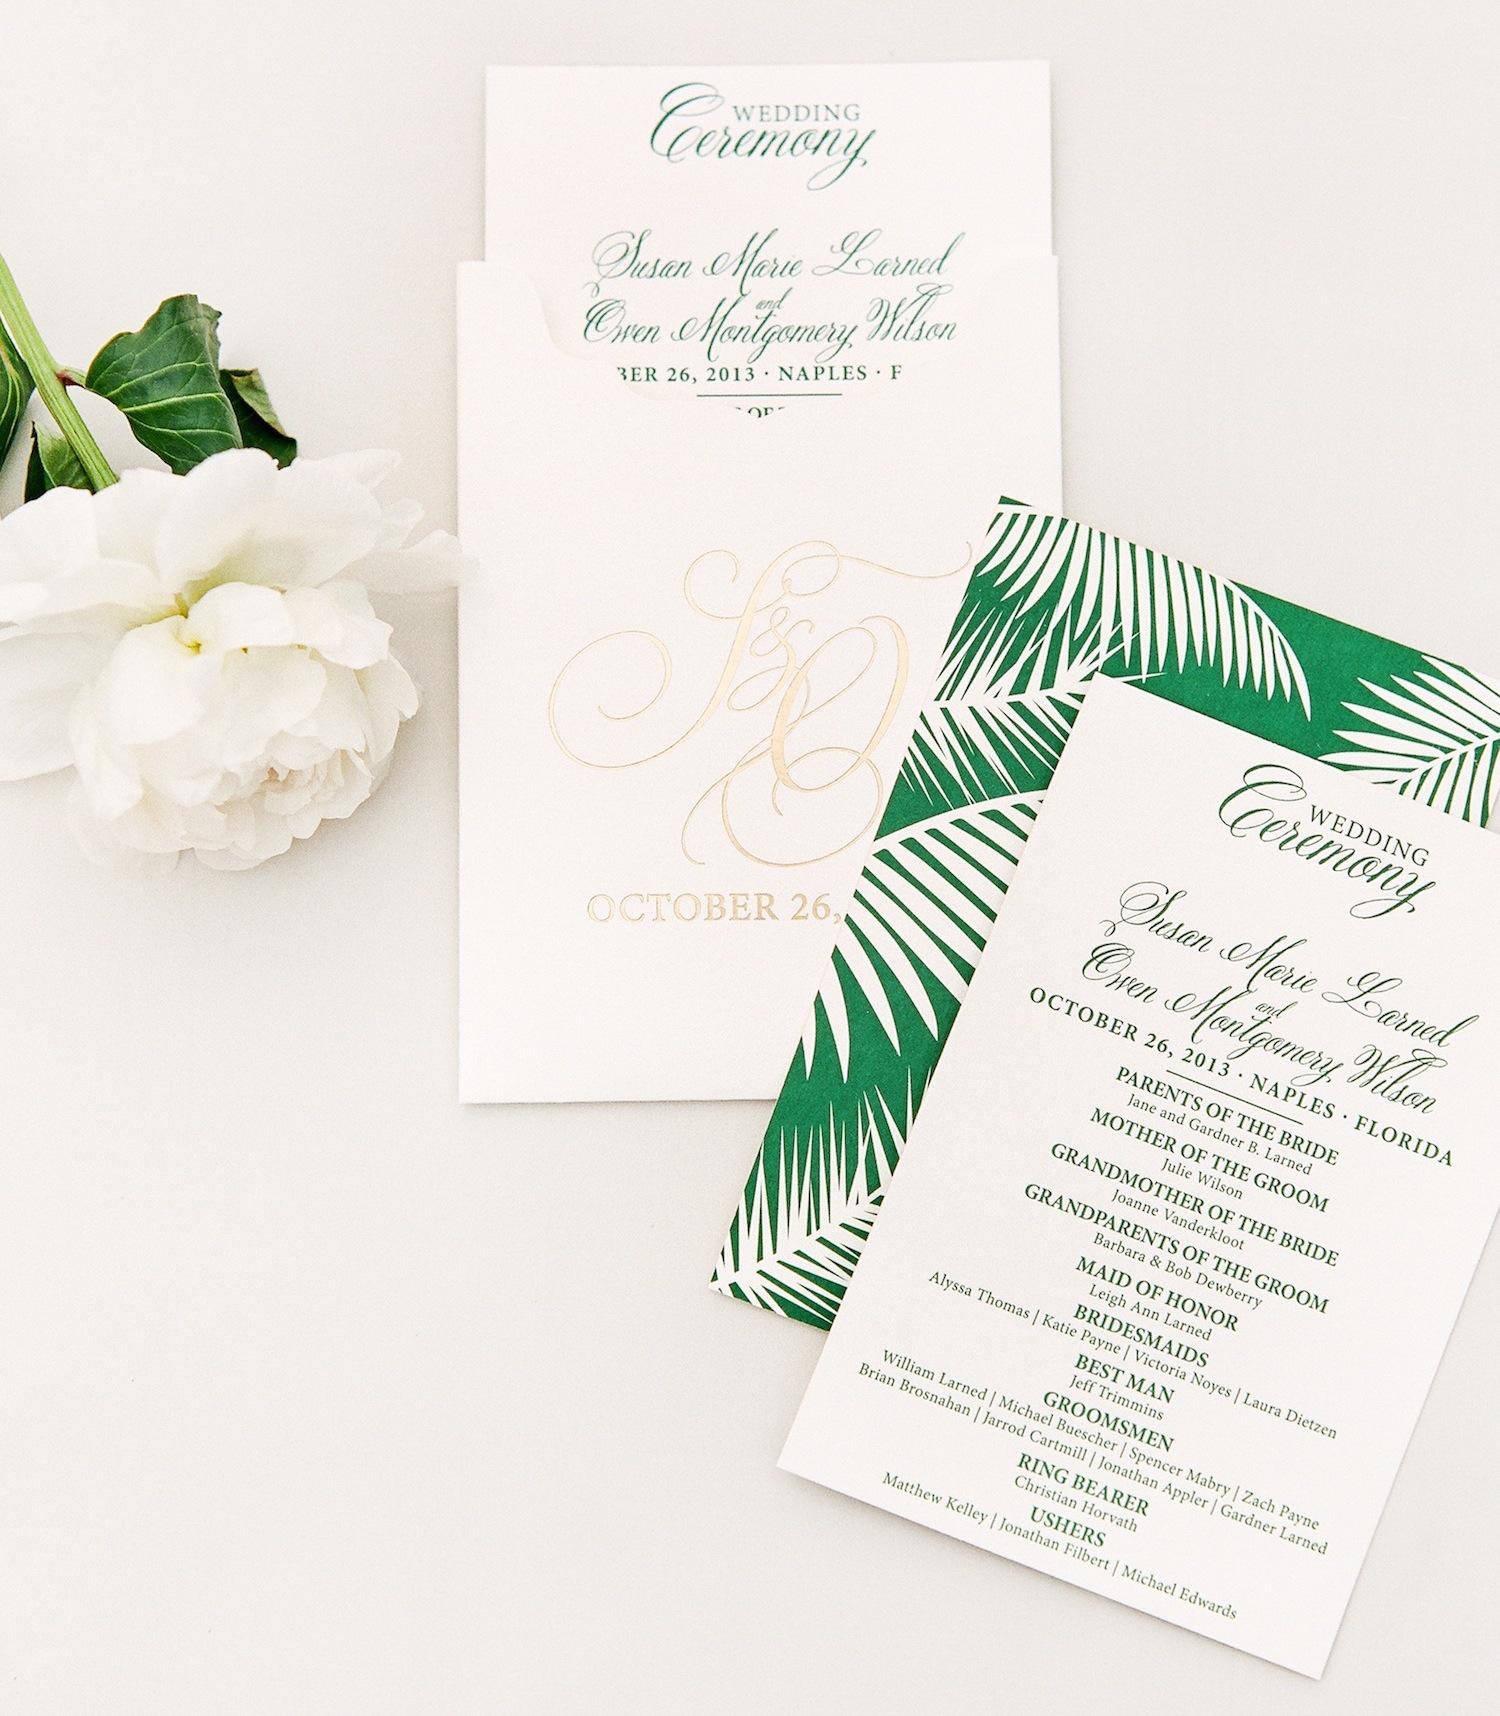 Dark green wedding ceremony program with attendants wedding party palm frond motif design